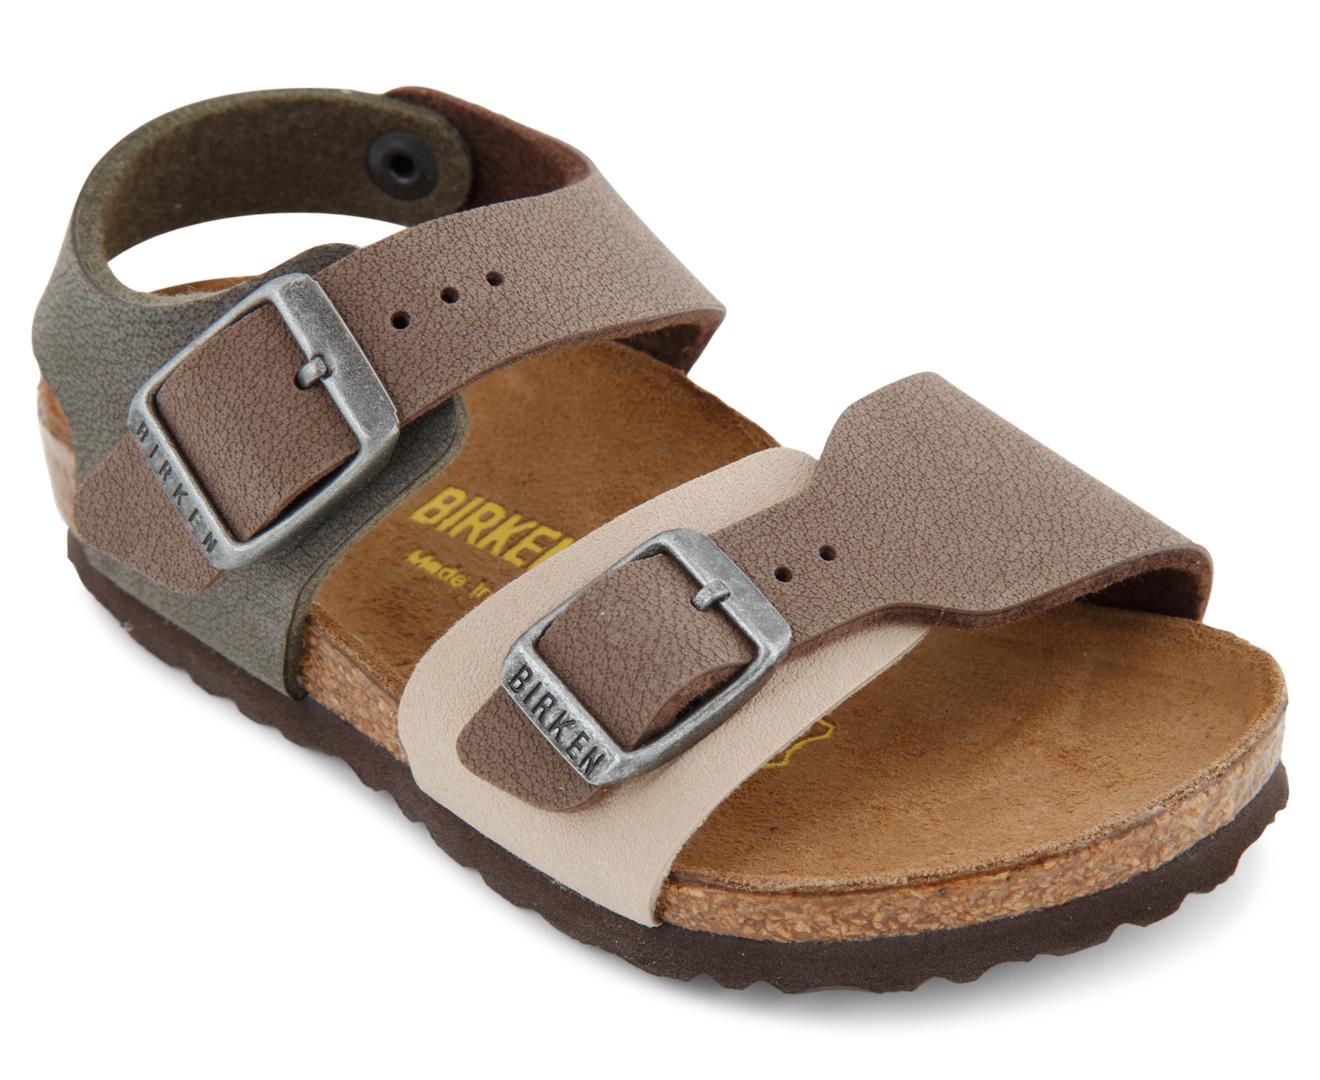 64a99a32904 Birkenstock Gizeh Fringe Sale Brand Shoes On Sale